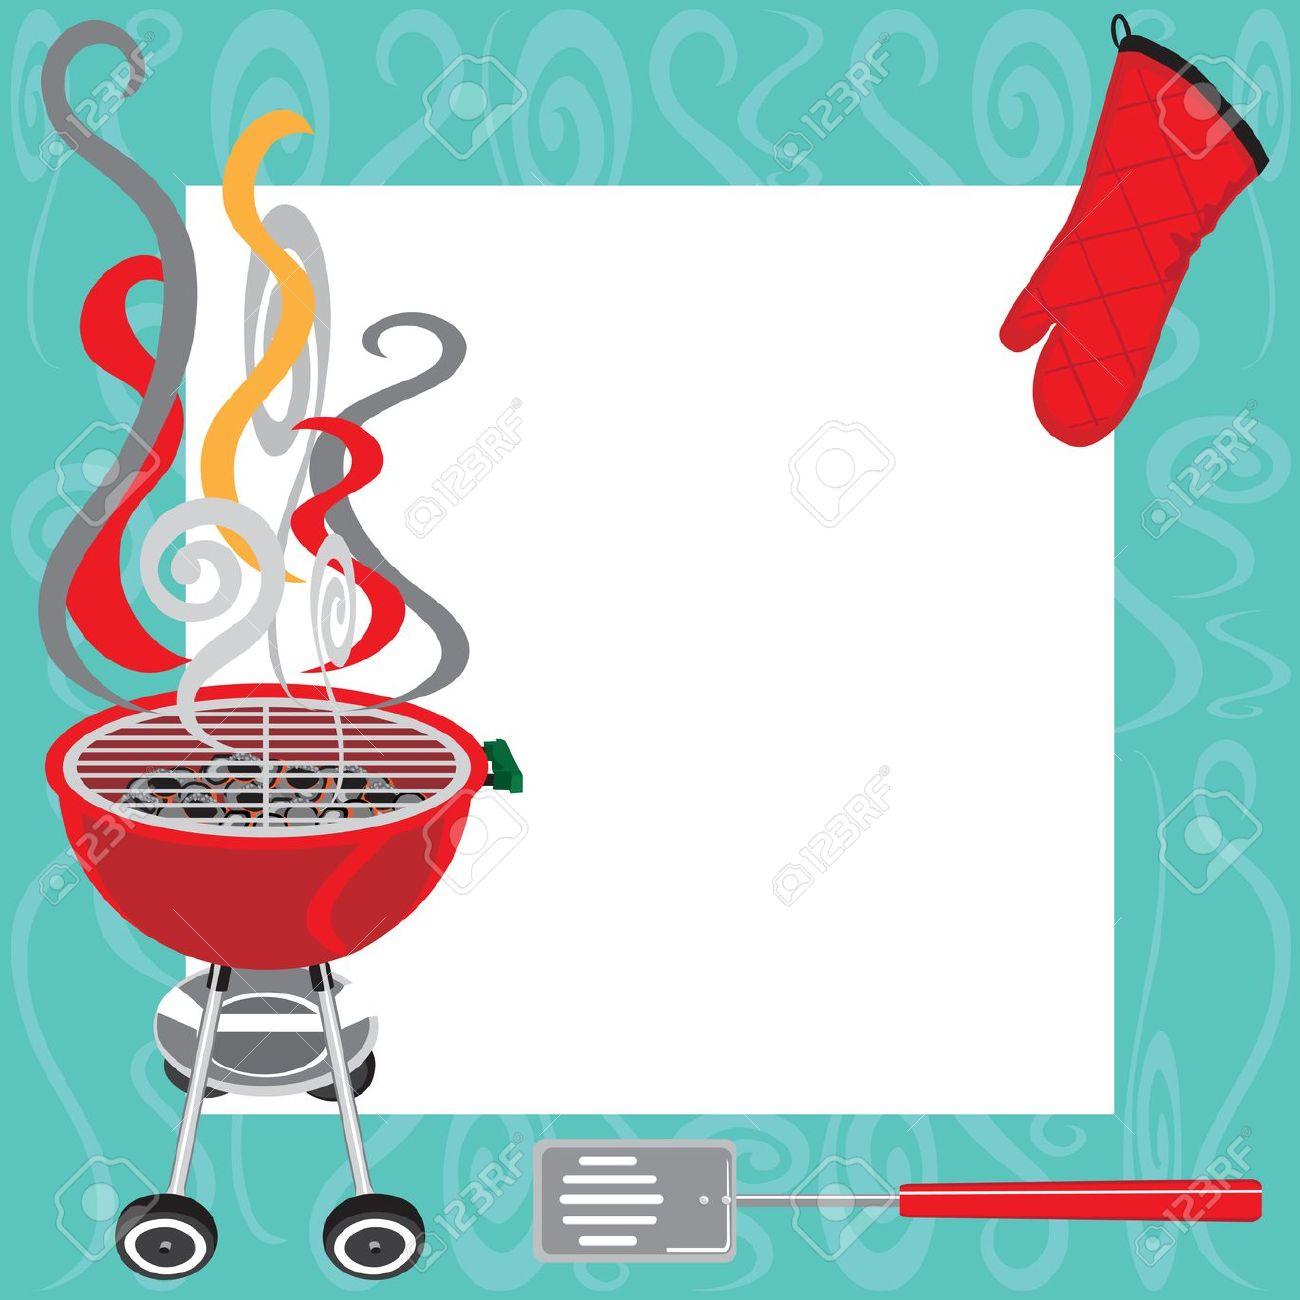 Barbecue clipart backyard bbq. For invitations